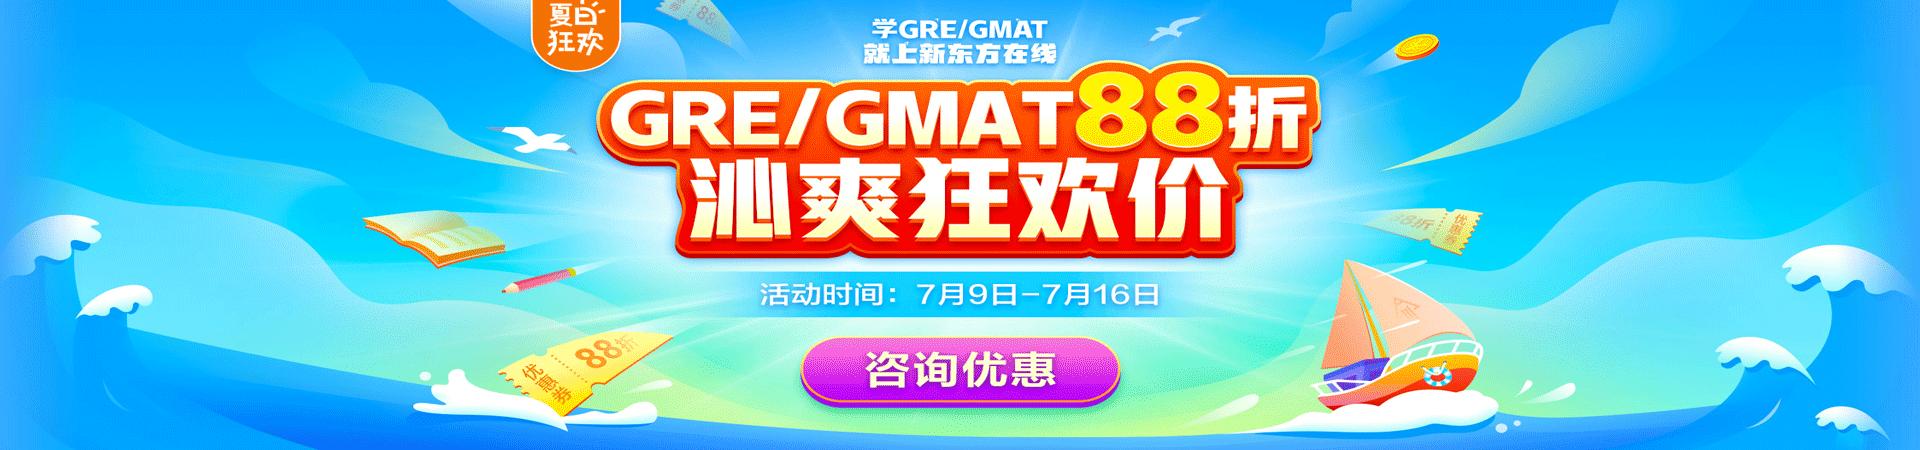 网络学习GMAT